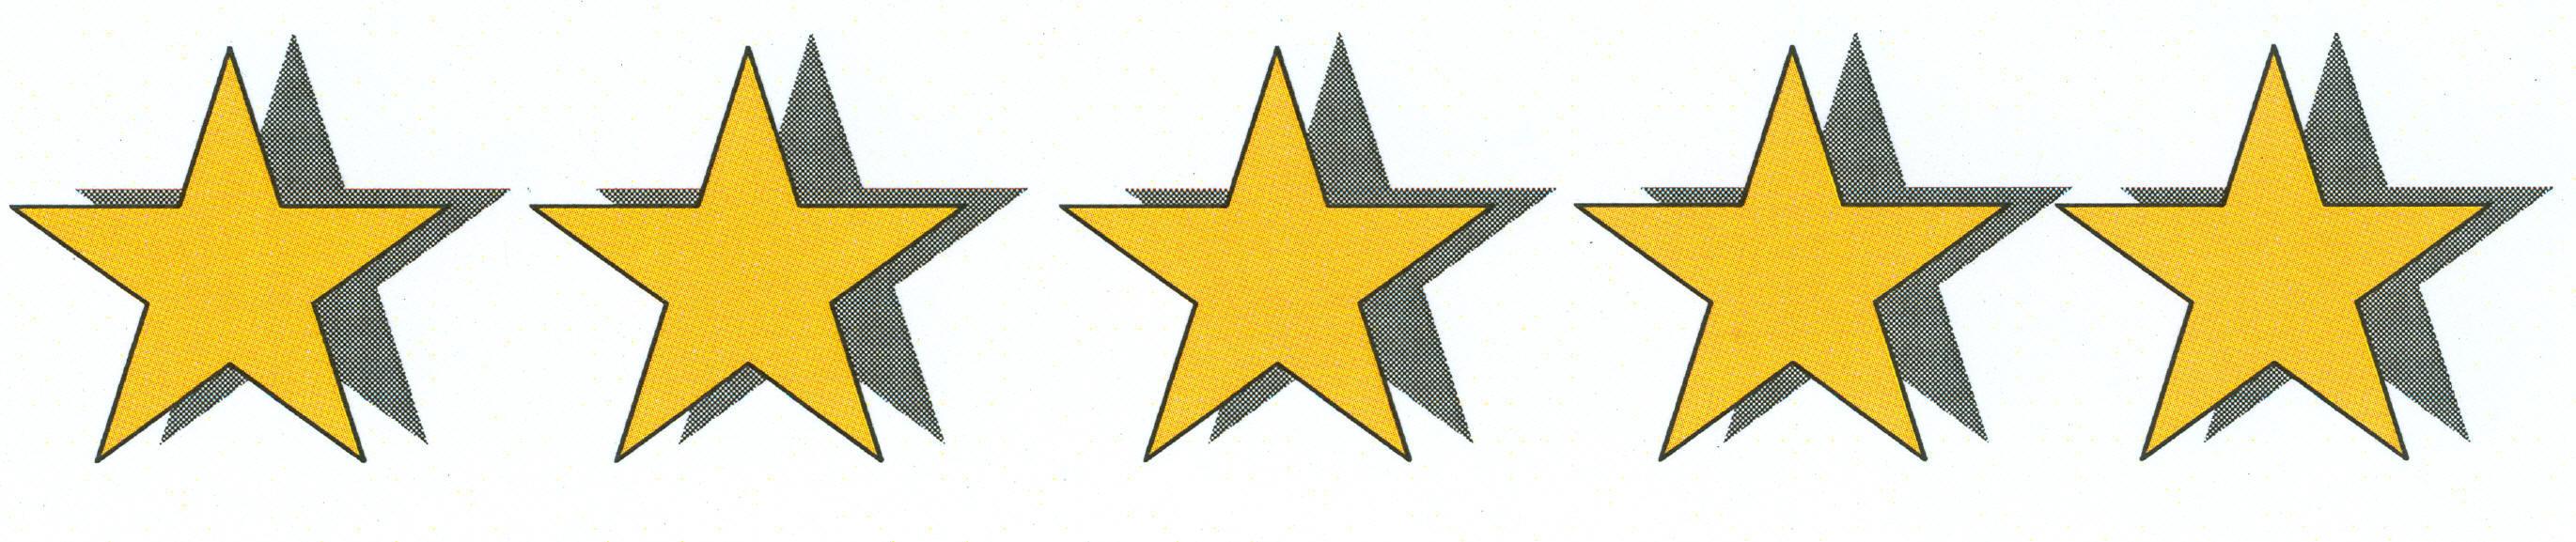 5_star